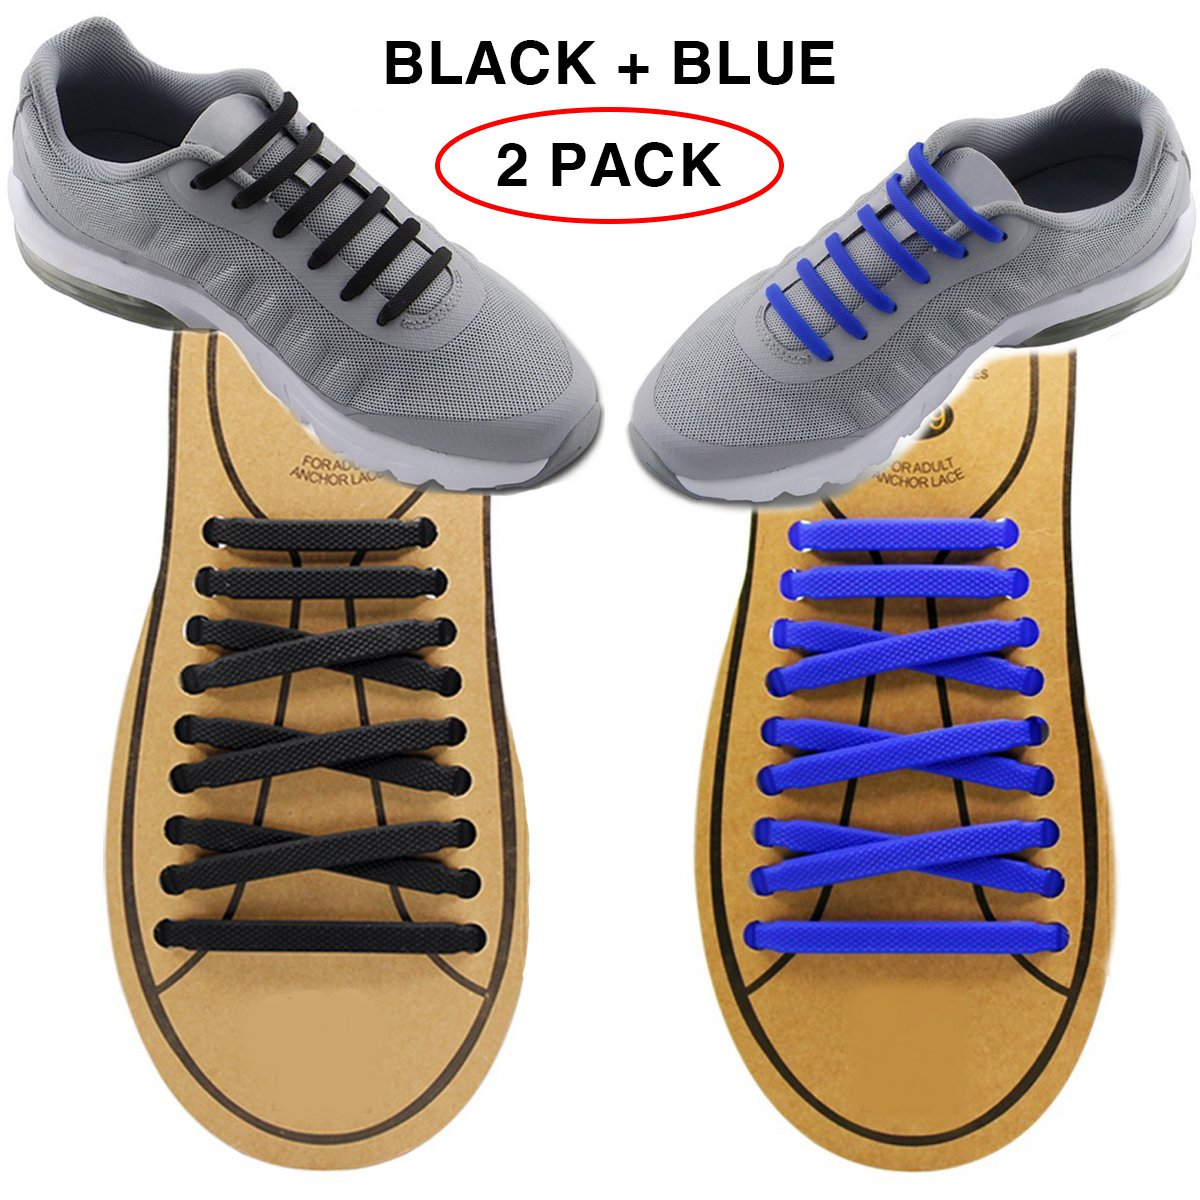 Extra No Tie Shoelaces for Men and Women – Bestのスポーツファン – 防水シリコンゴムフラットAthletic Running Shoe Lacesマルチカラースニーカーブーツボードの靴およびカジュアル B076TFF672 Black + Blue Black + Blue